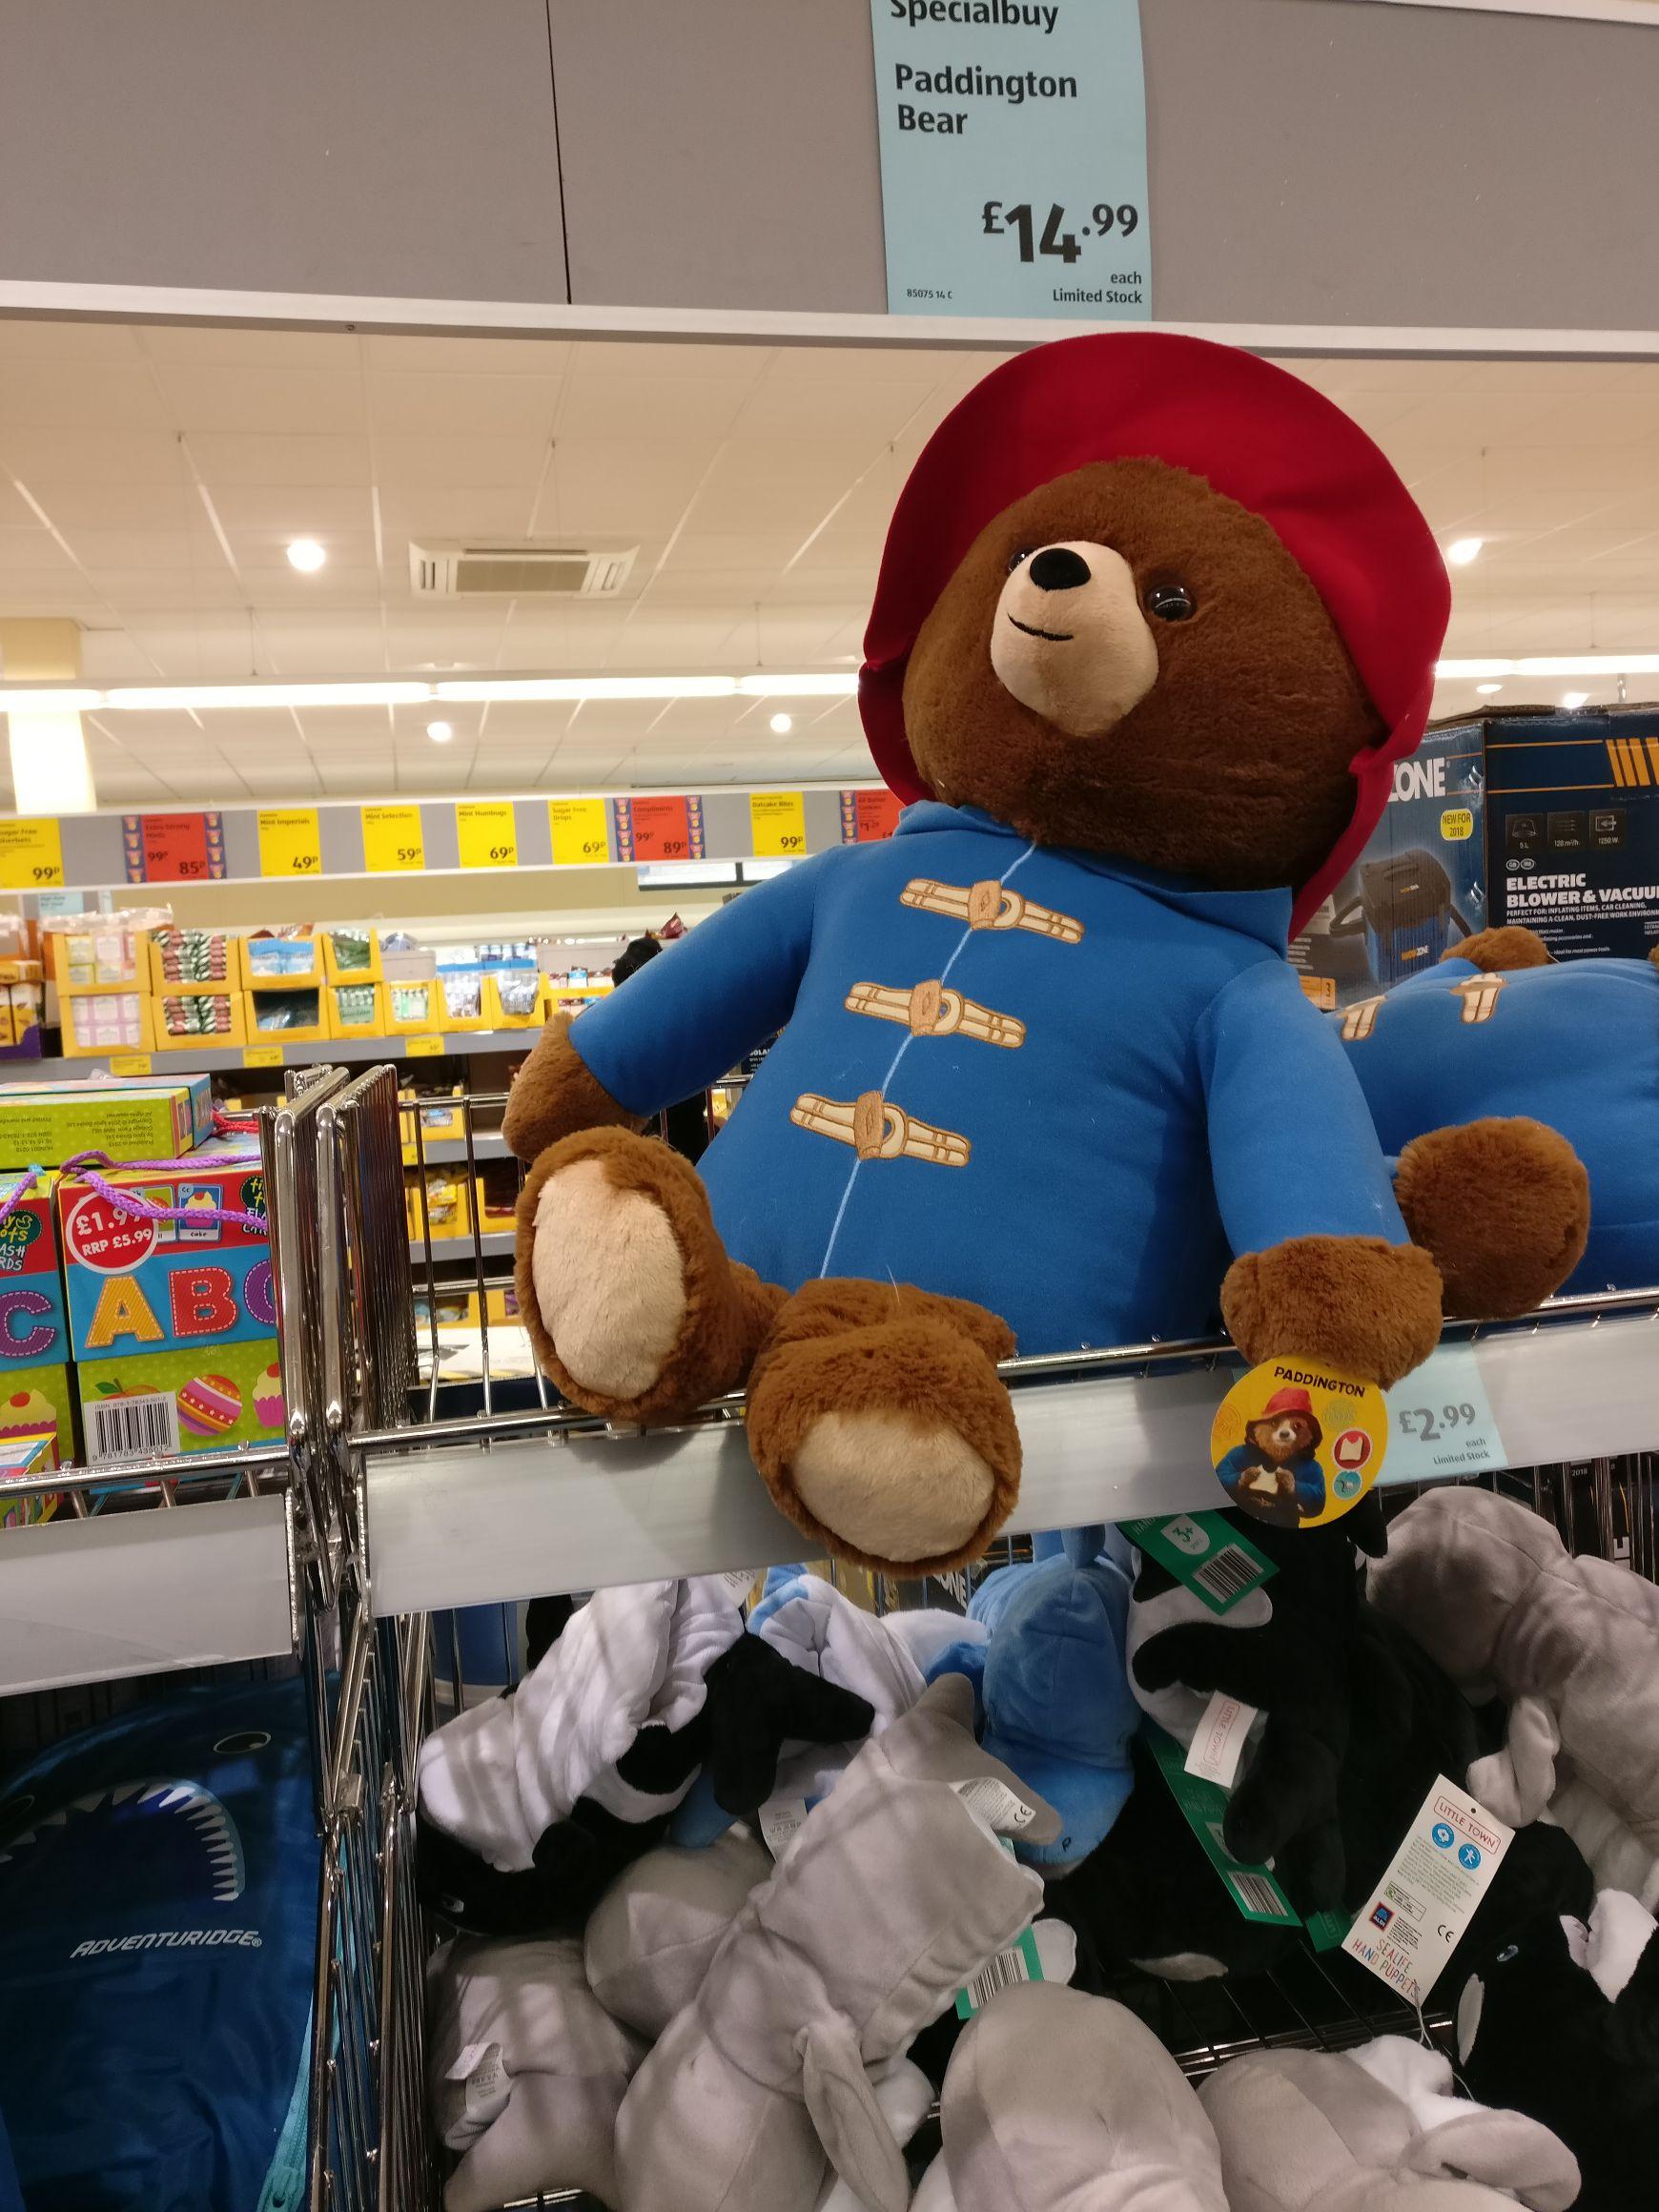 Paddington Bear £14.99 @ Aldi